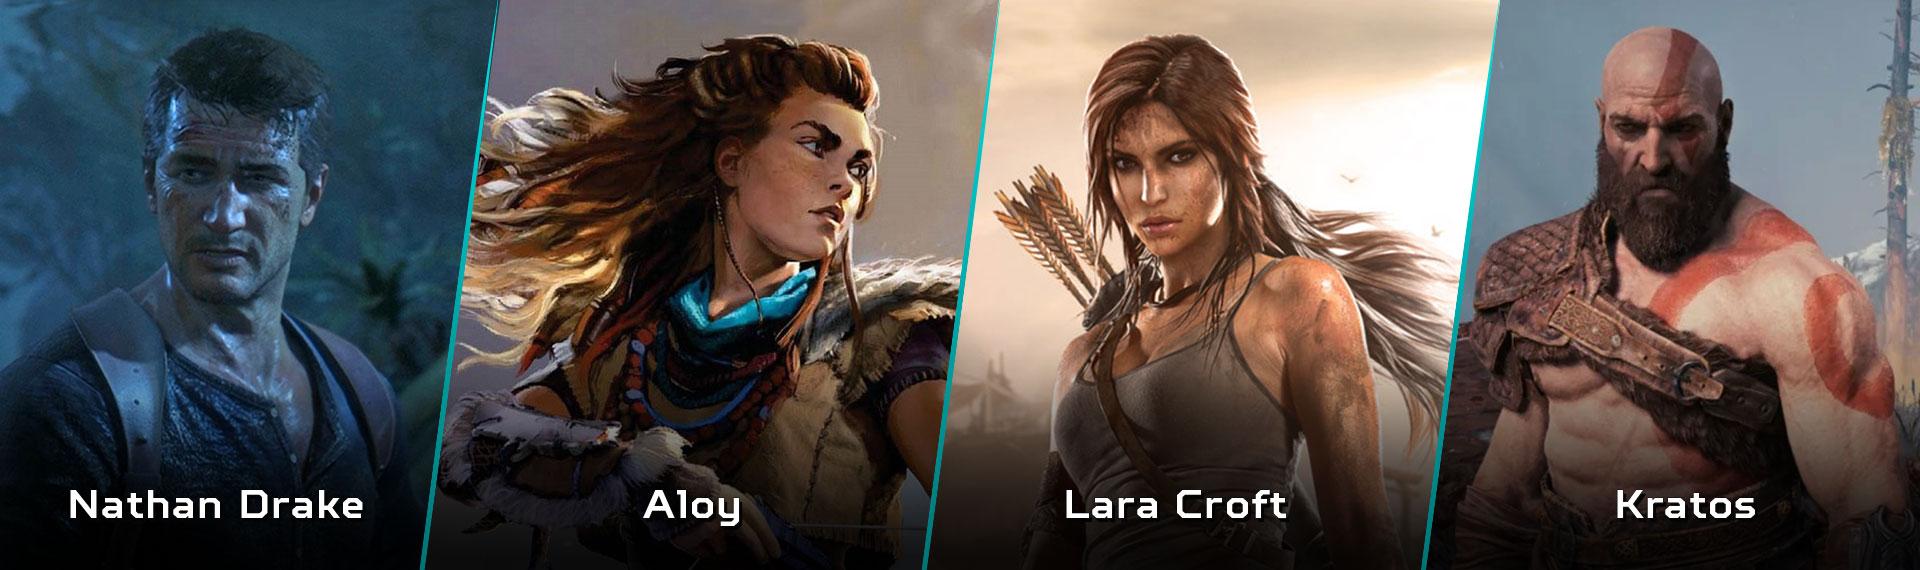 5 Karakter Game Terbaik Sepanjang Masa. Mana Favorit Kamu?